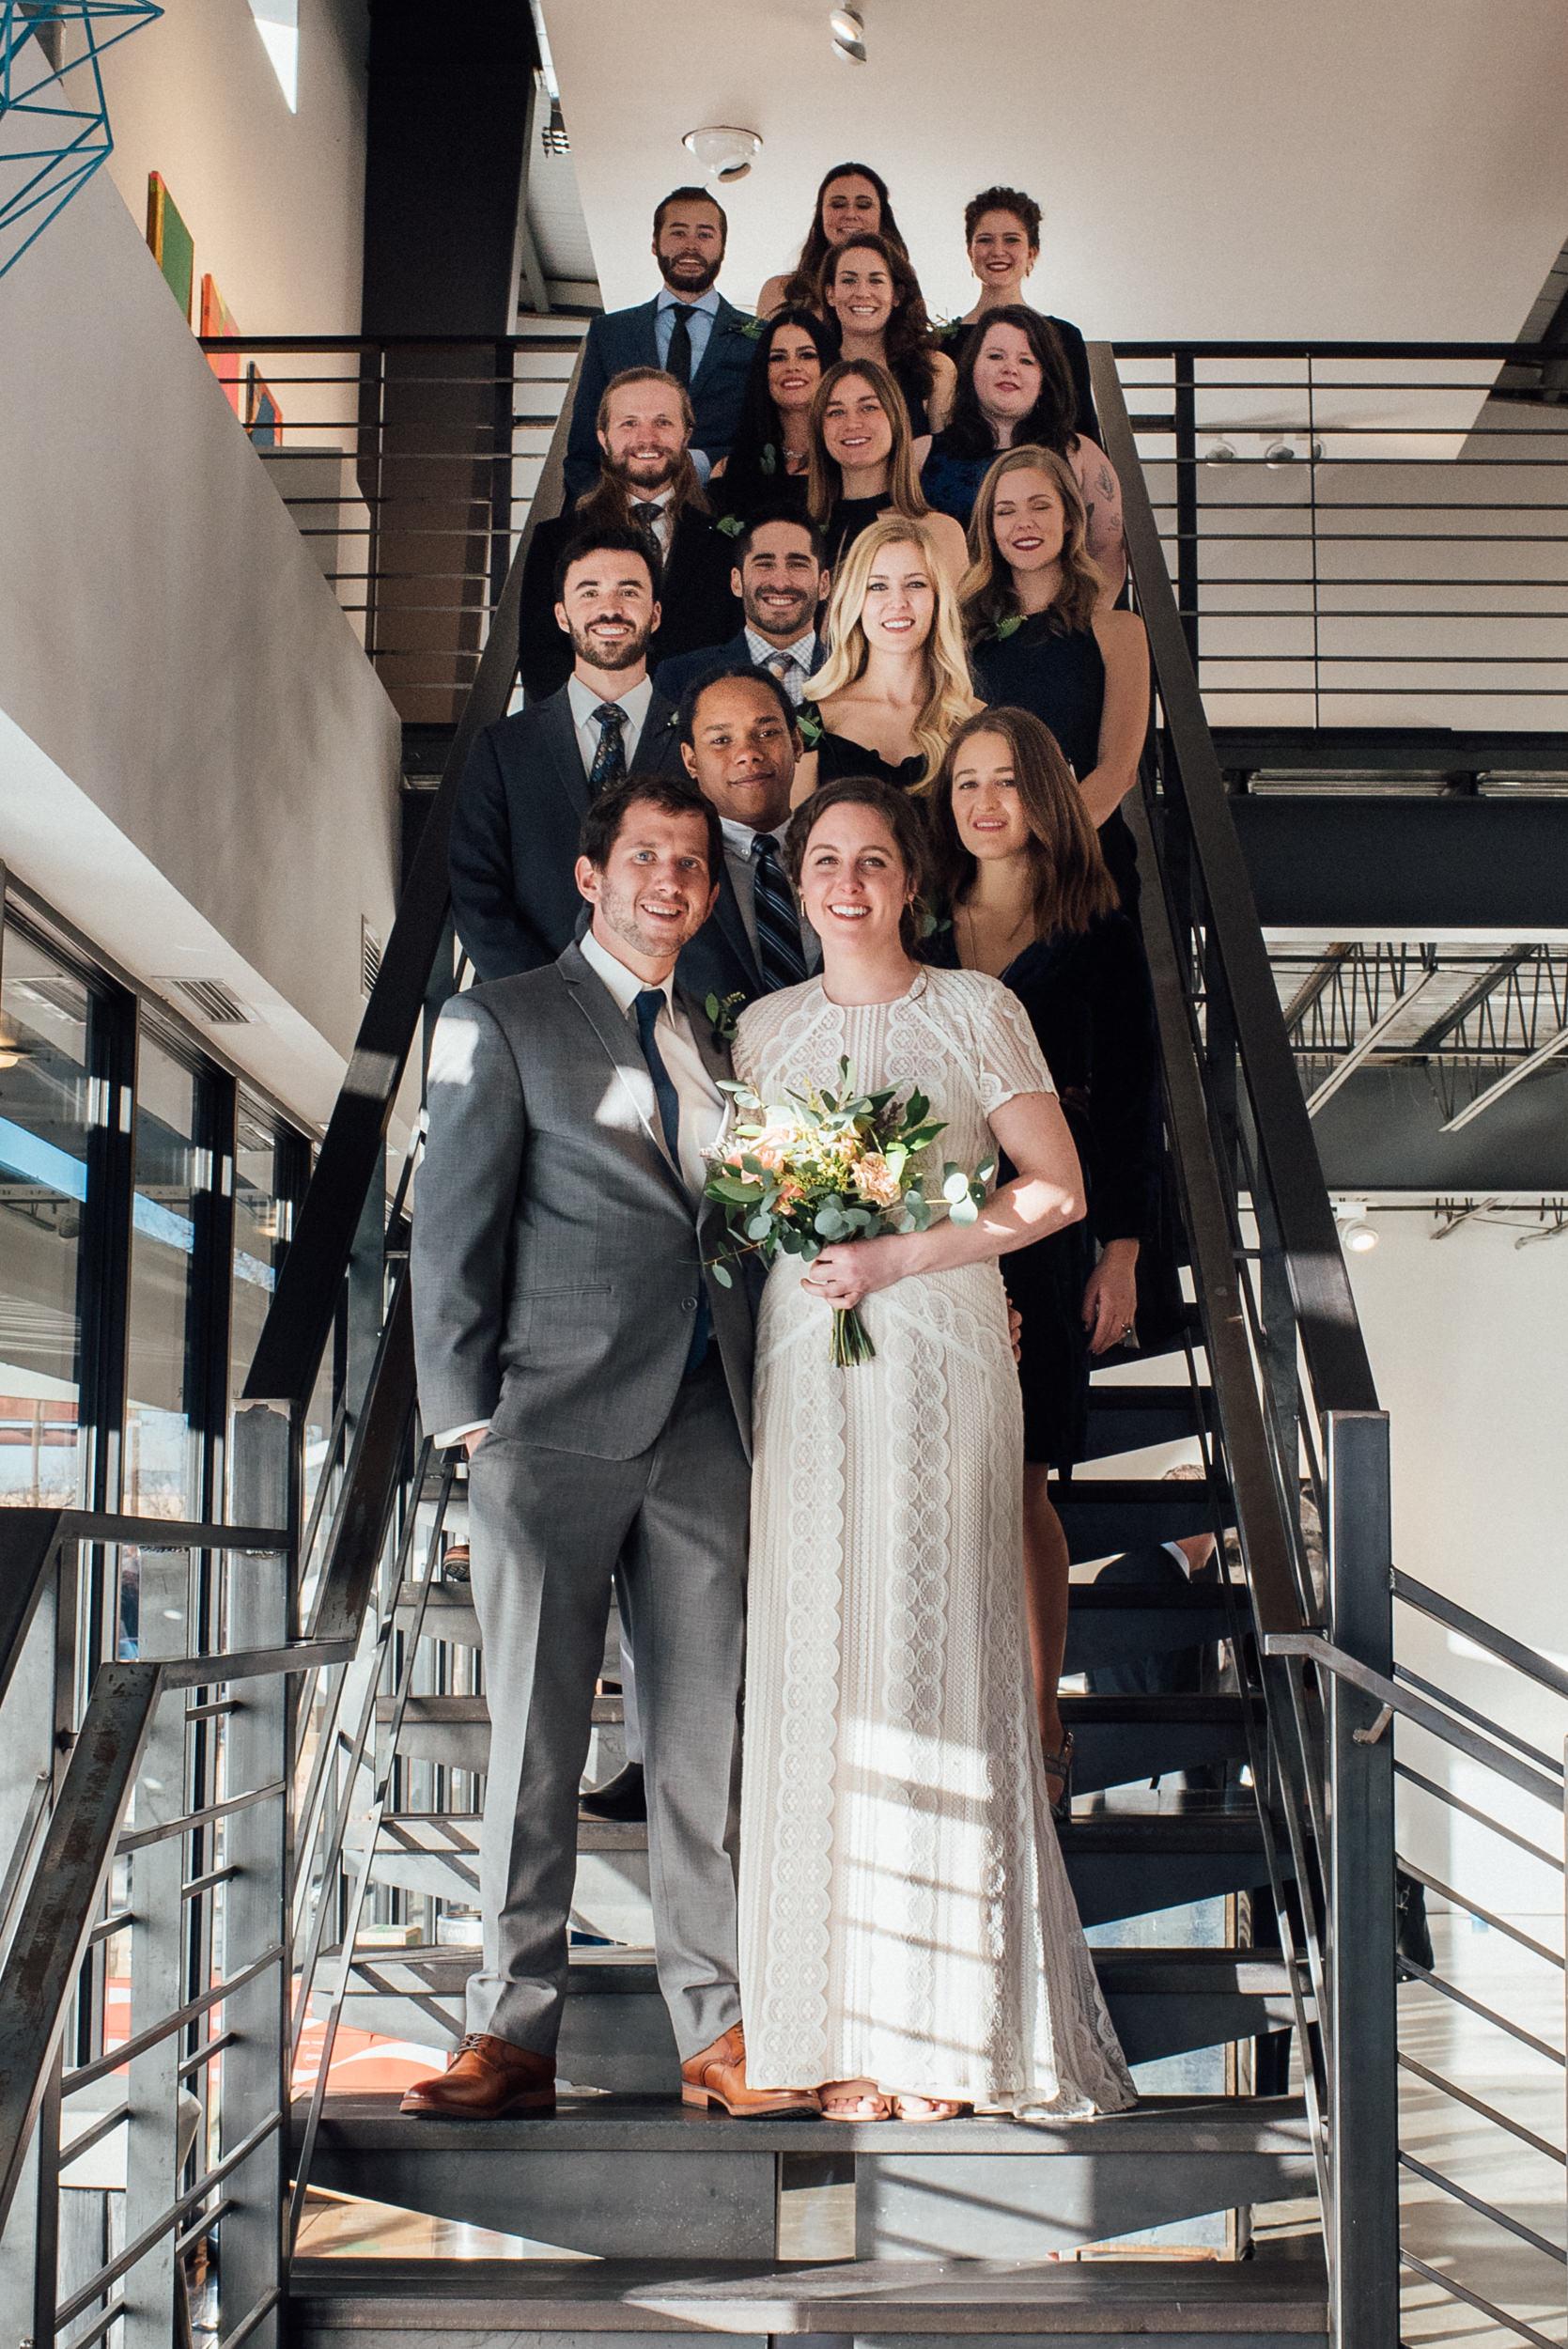 Fierce Bridal party at intimate Denver Space Gallery Wedding-Colorado Wedding Photographer